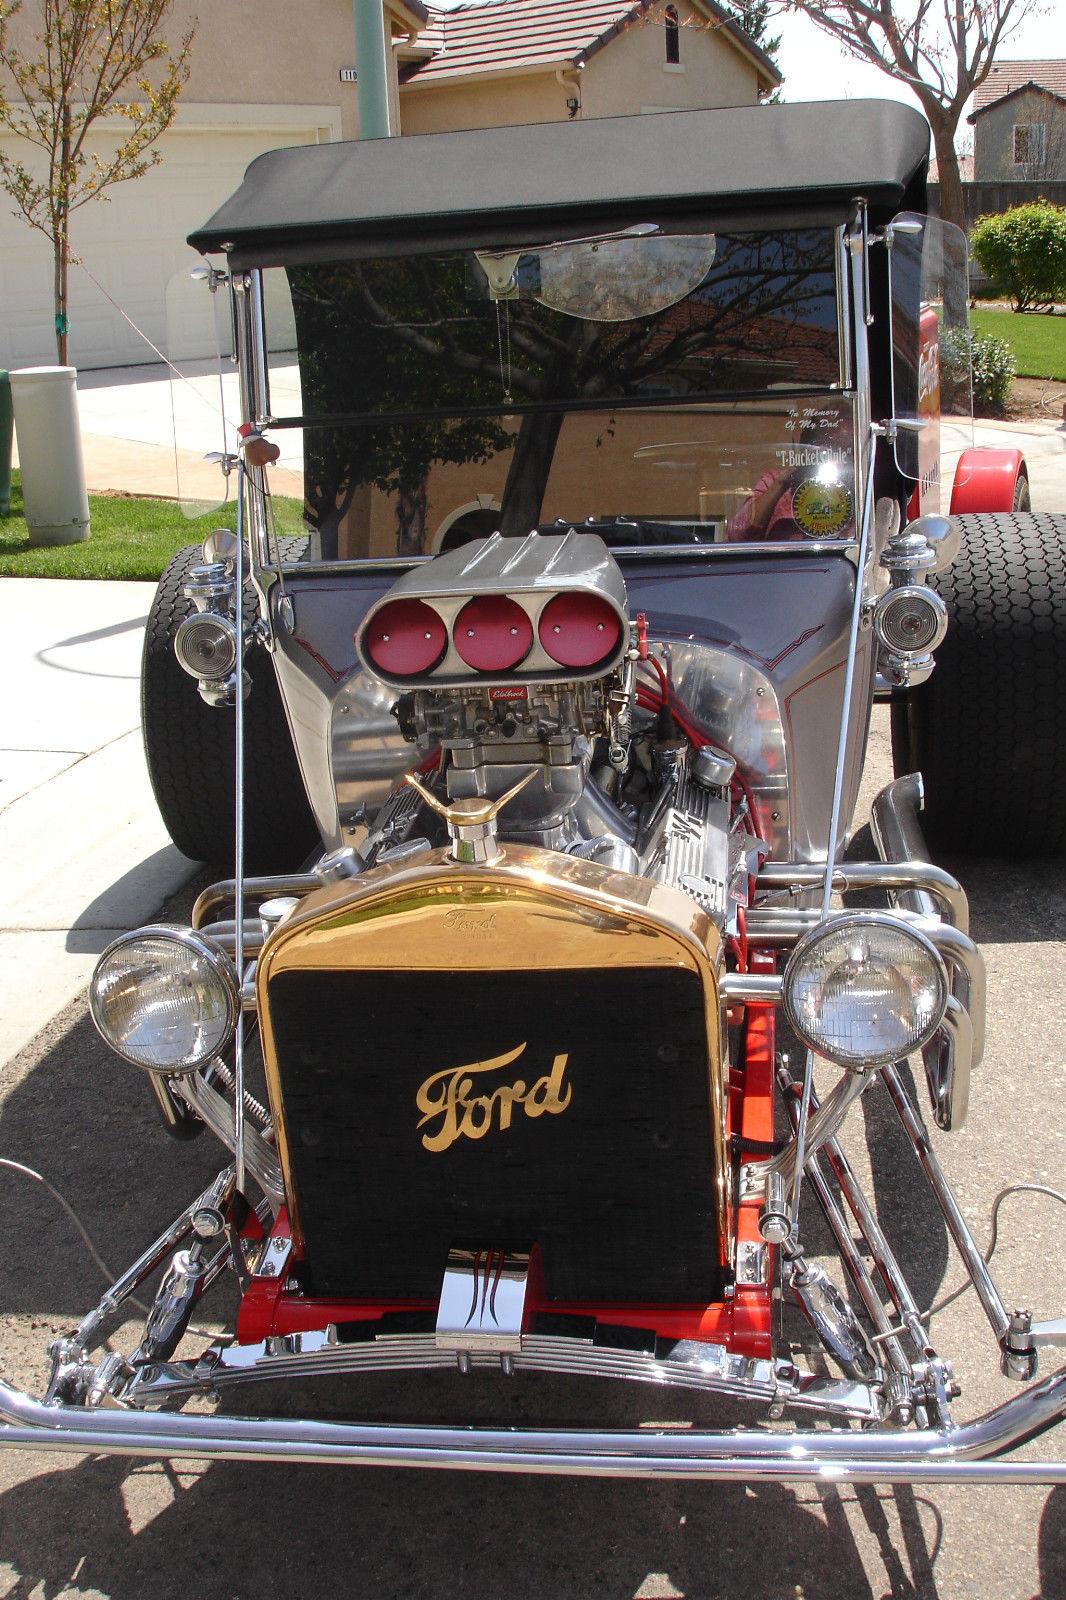 Ford Fiberglass T Bucket With Coca Cola Trailer